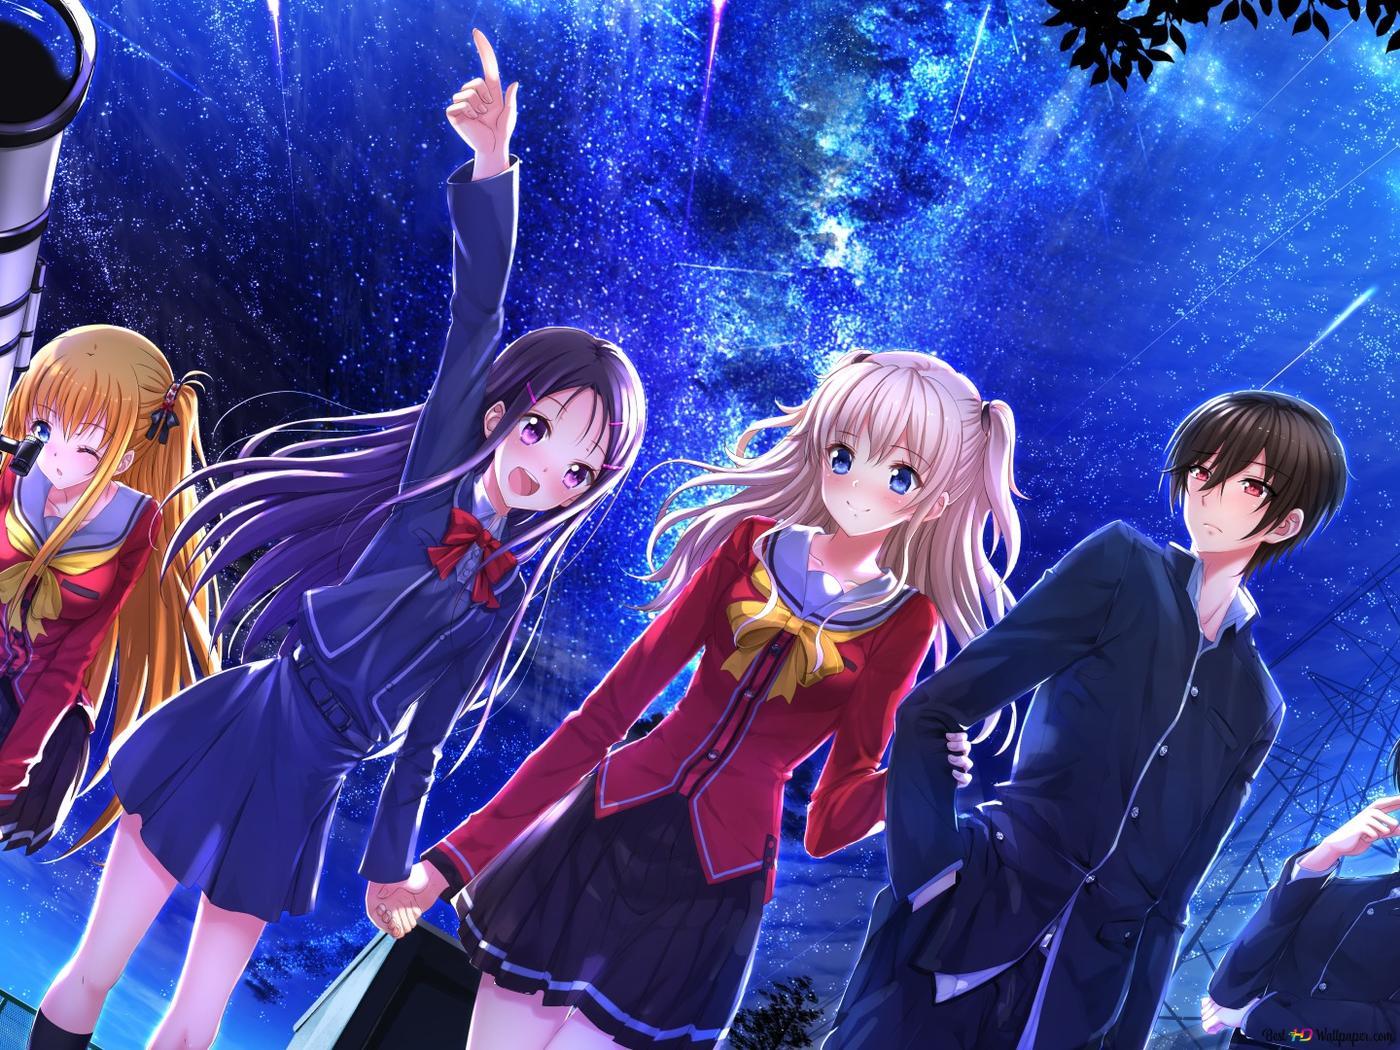 Charlotte Anime Hd Wallpaper Download